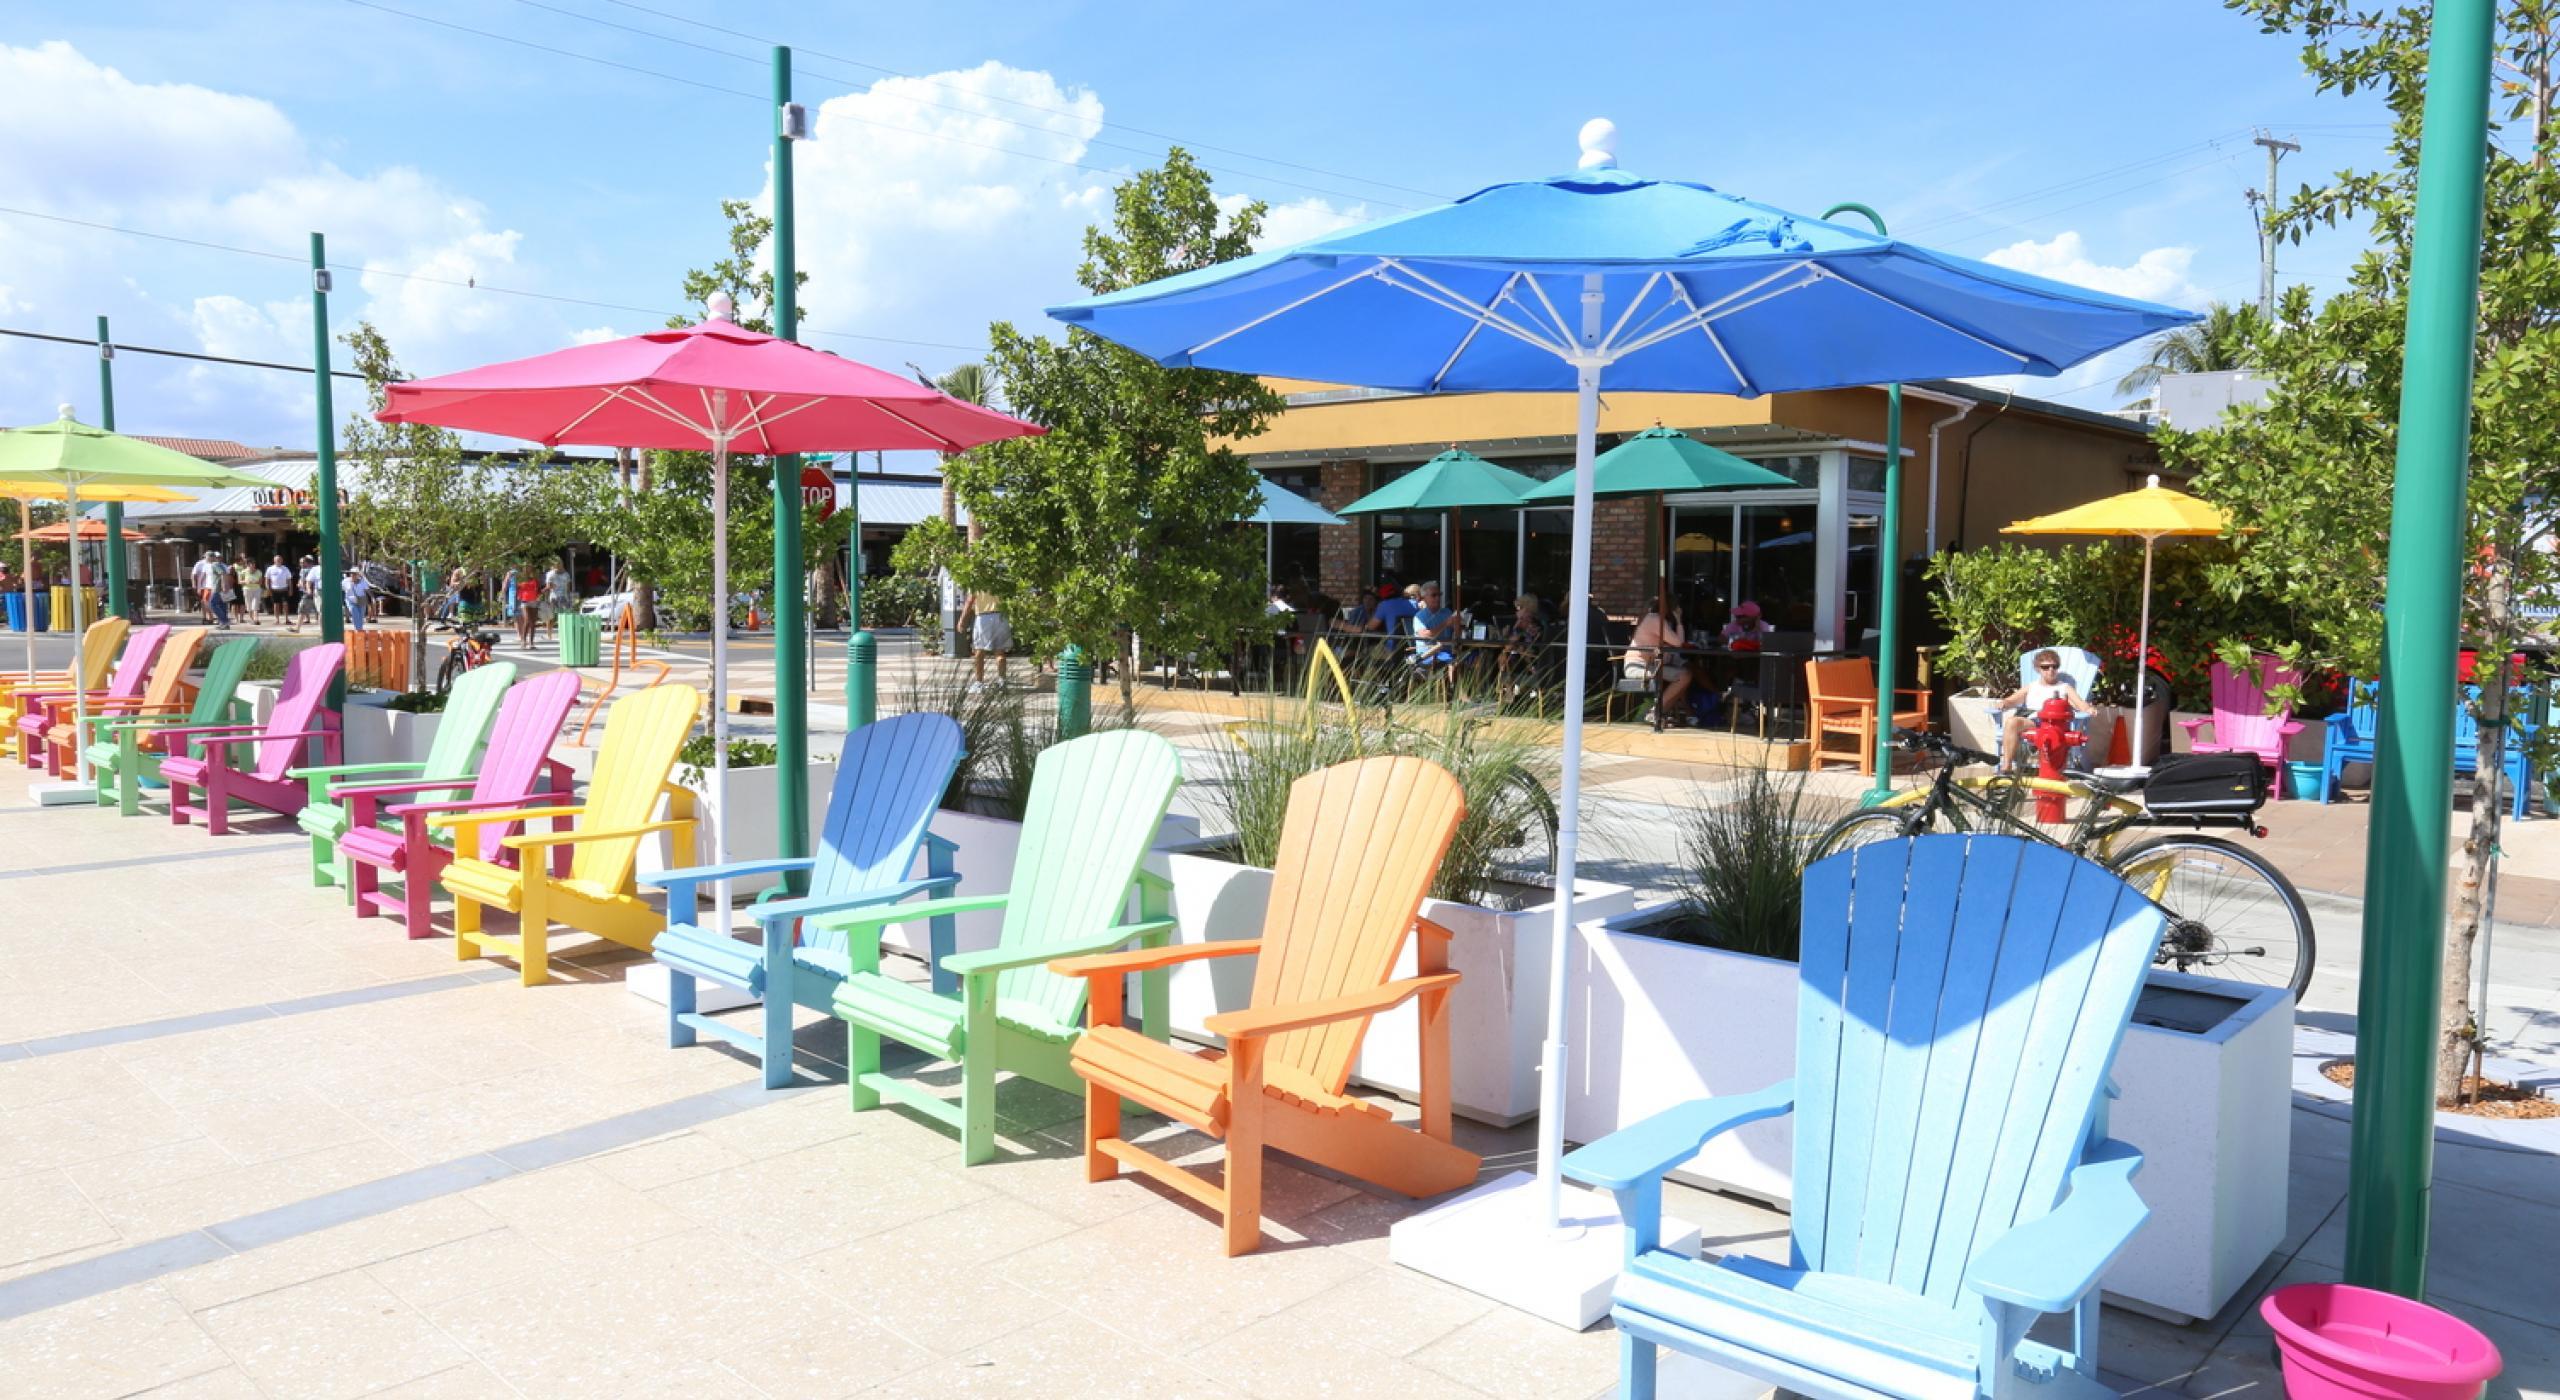 Fort Lauderdale Shopping Und Gastronomie Unter Strahlender Sonne Visit The Usa